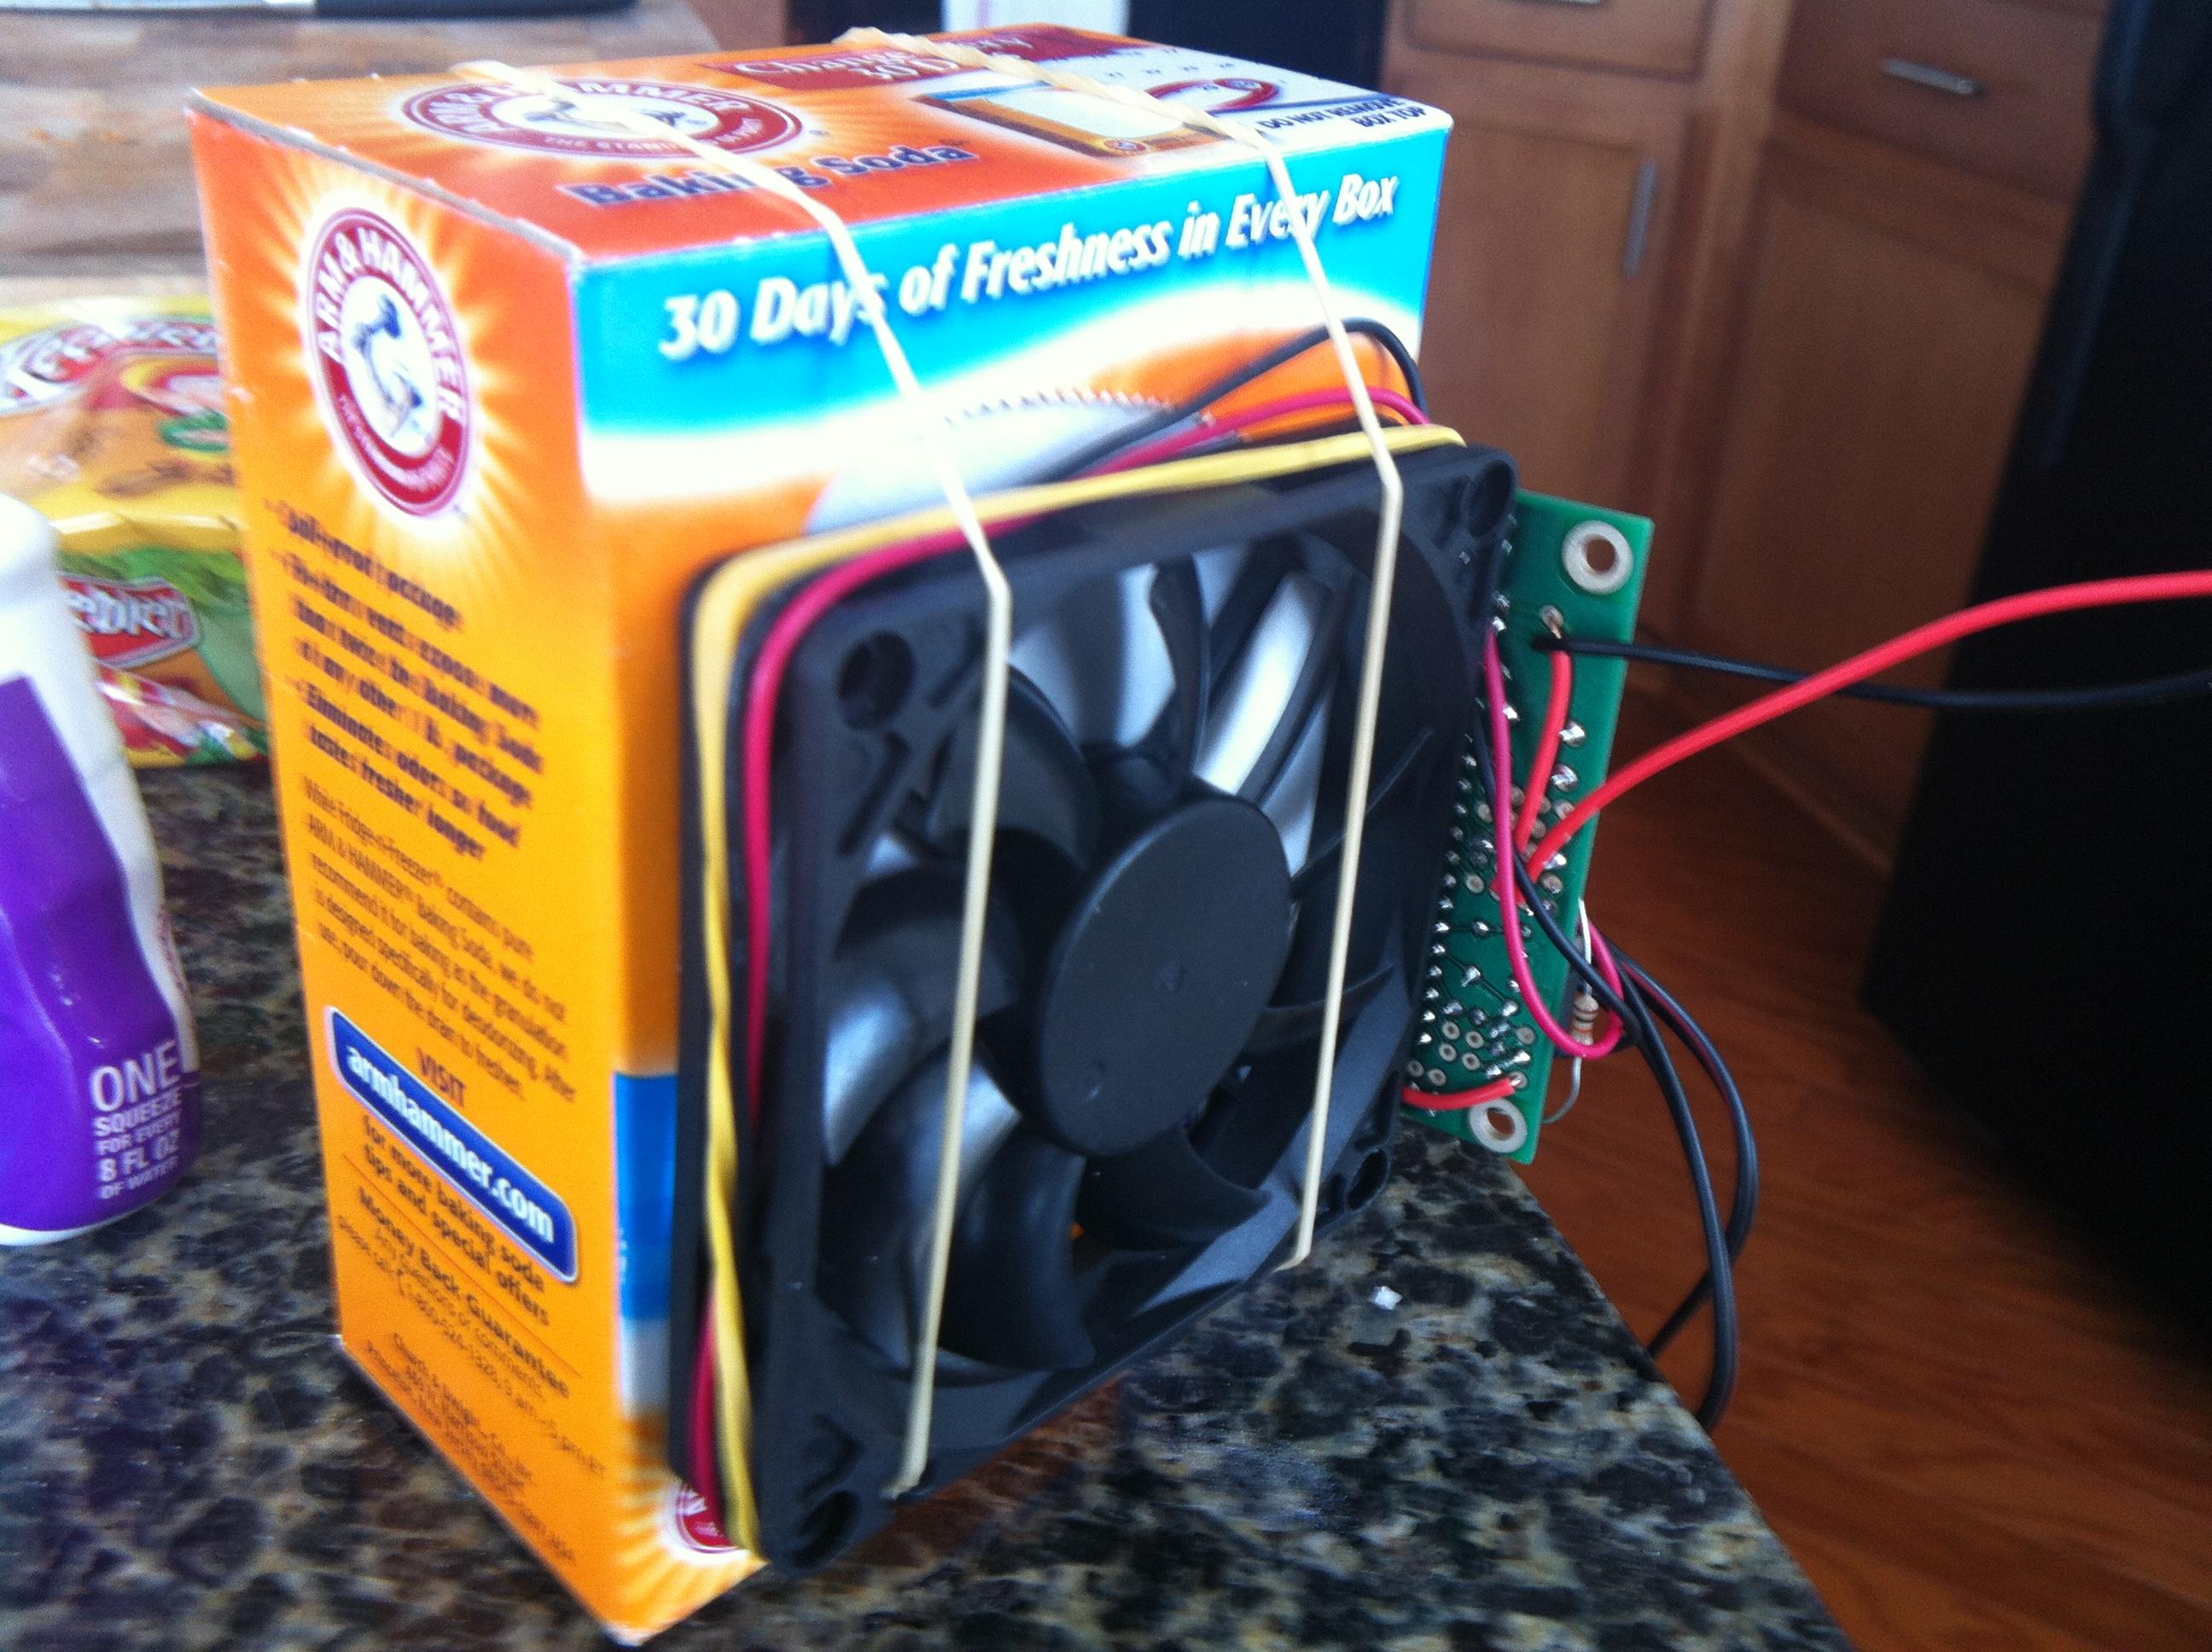 Build a cat litter box fan with Arduino